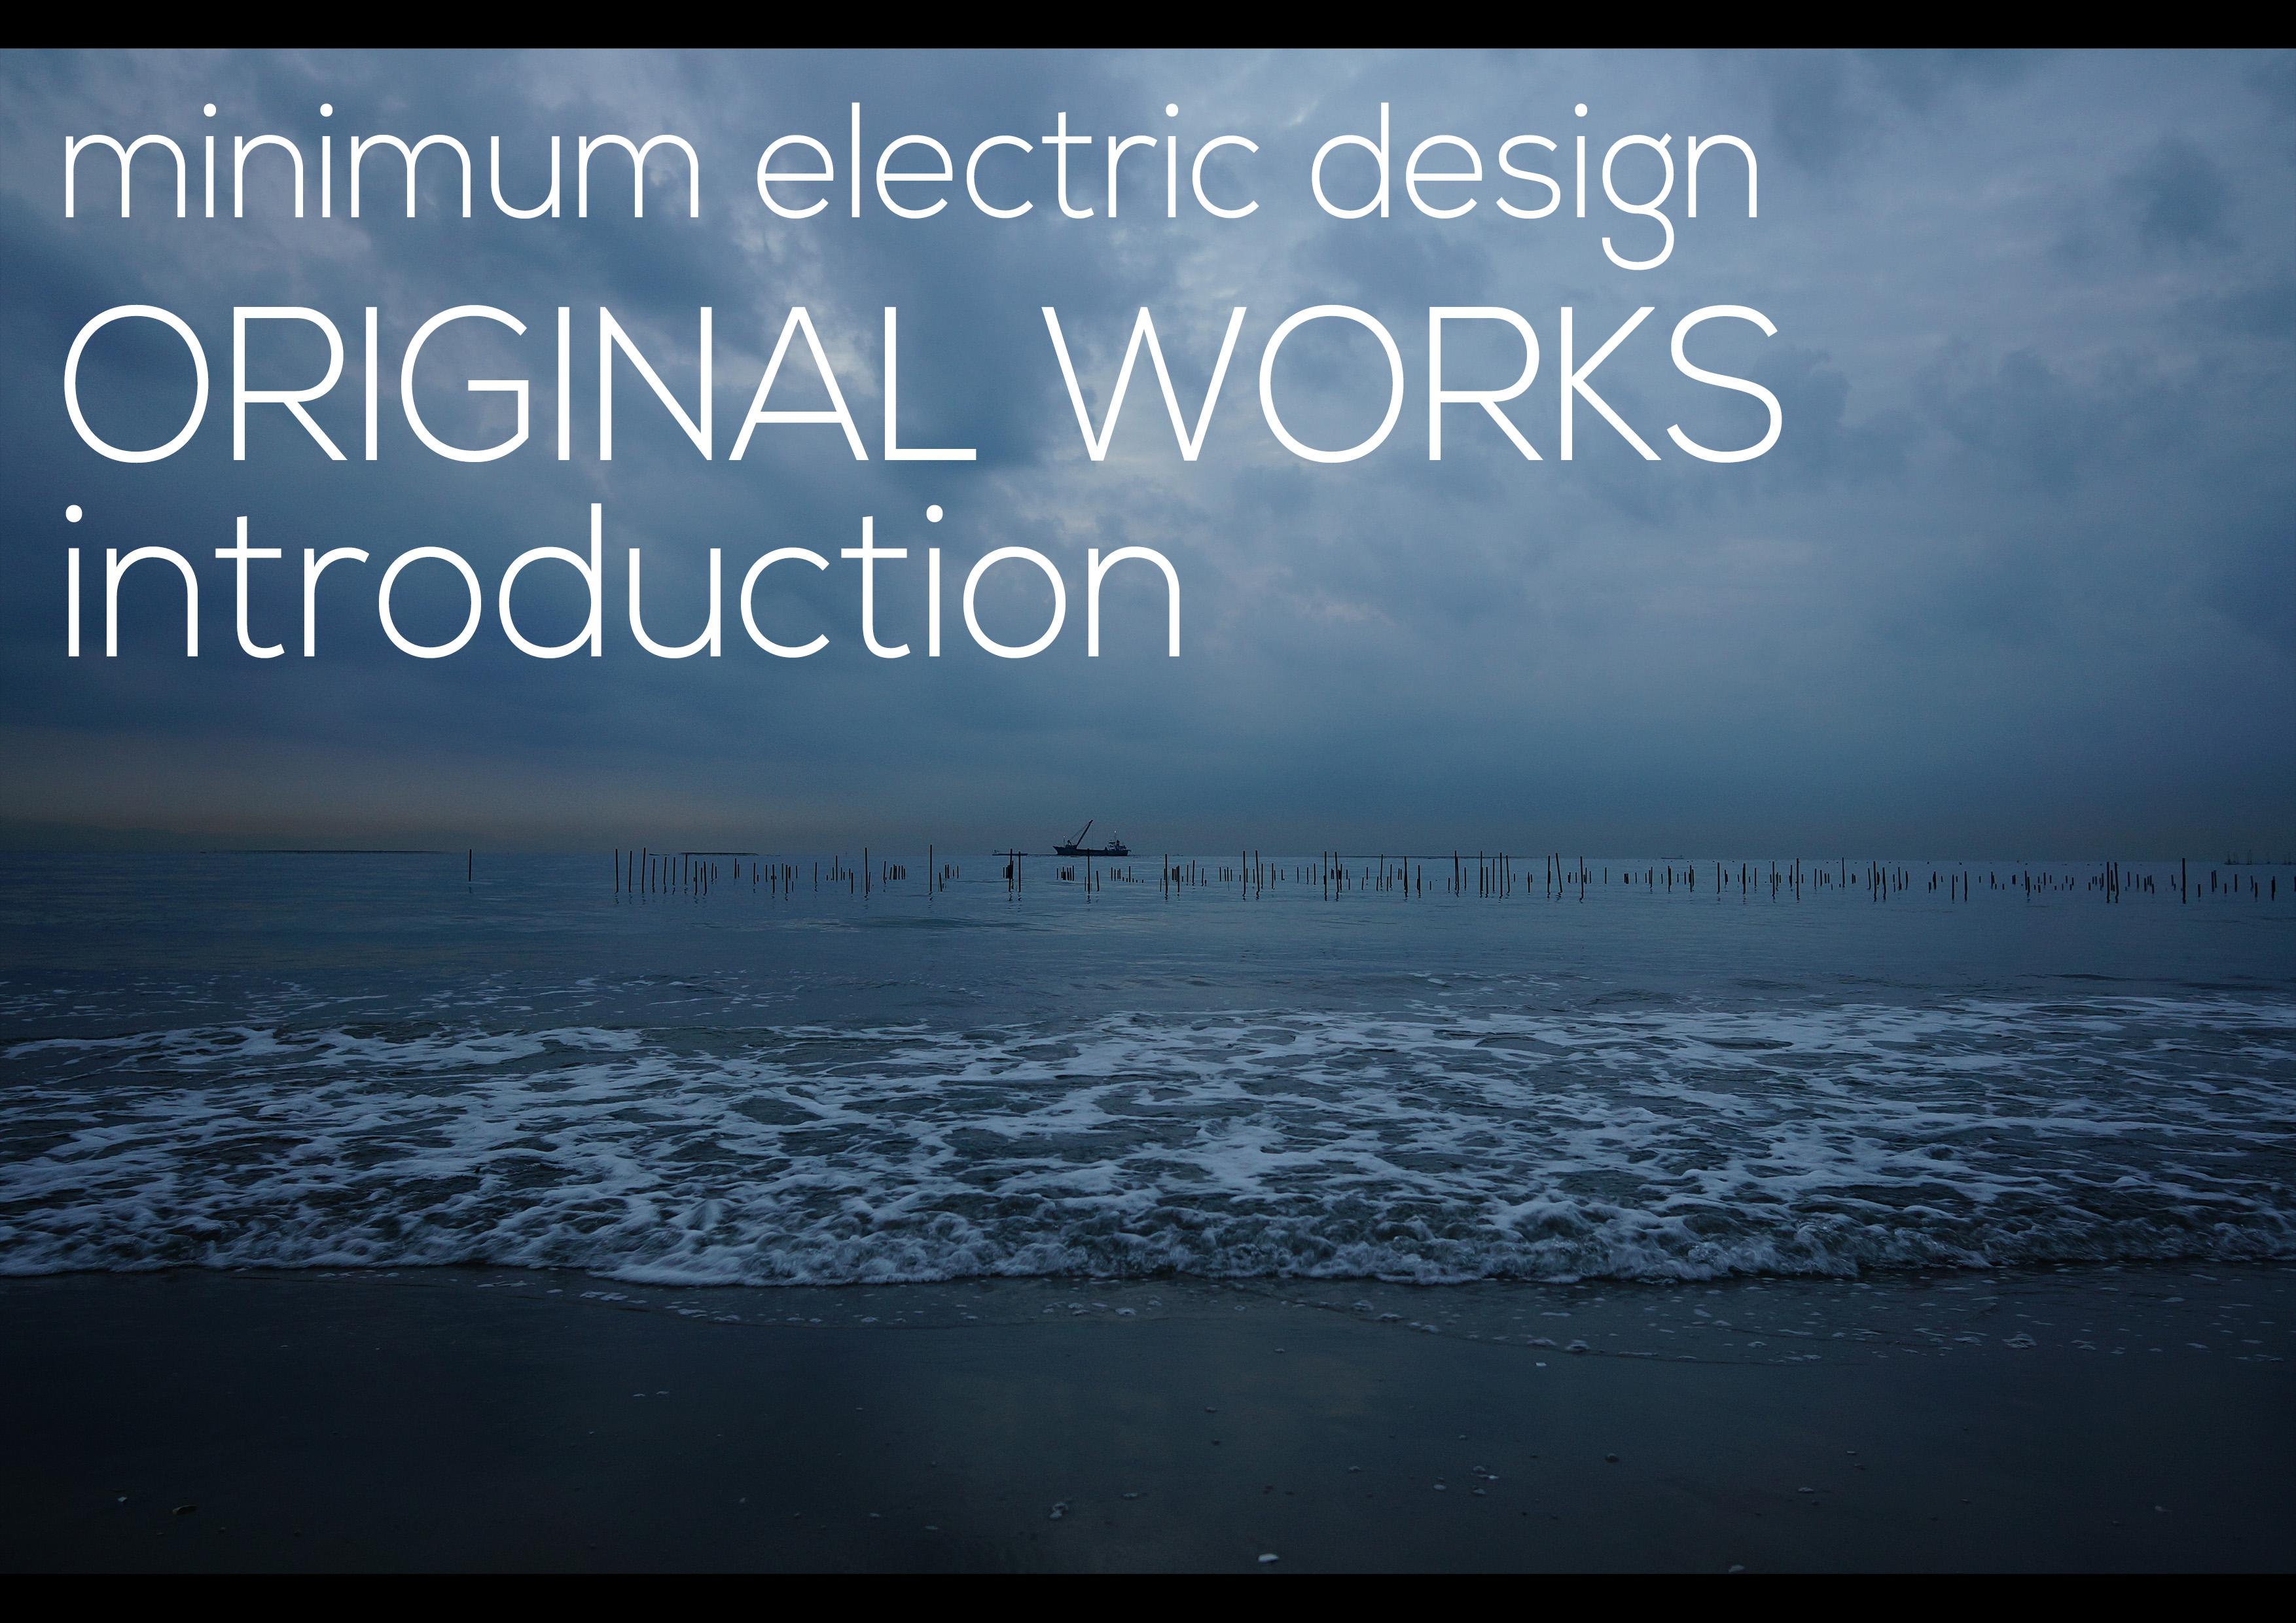 ORIGINAL WORKS introduction (C87頒布)